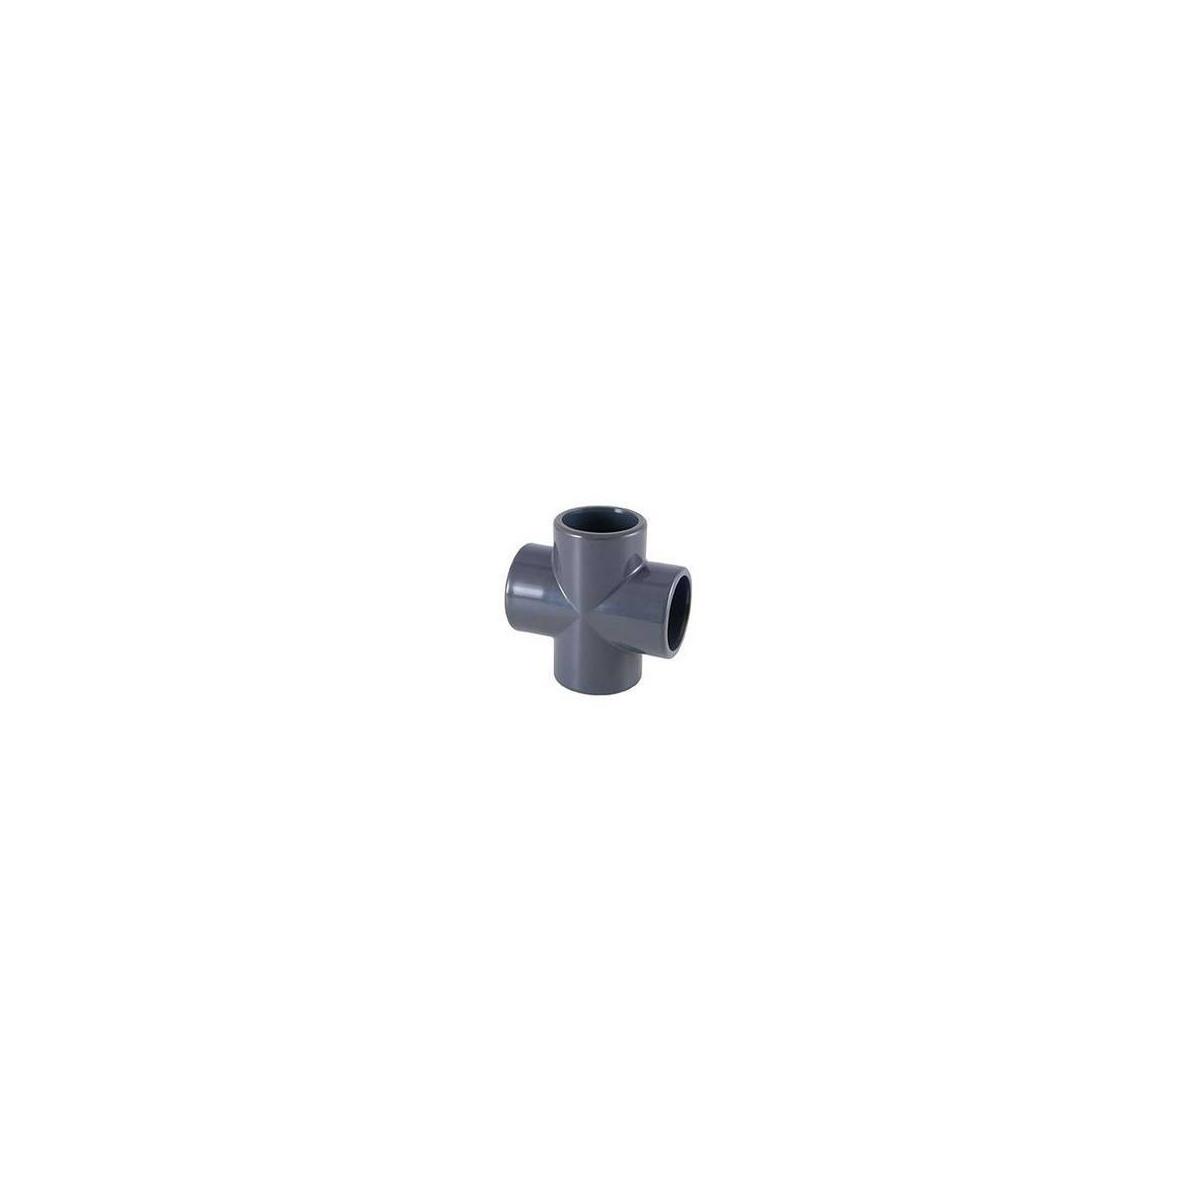 PVC CROSS solvent socket